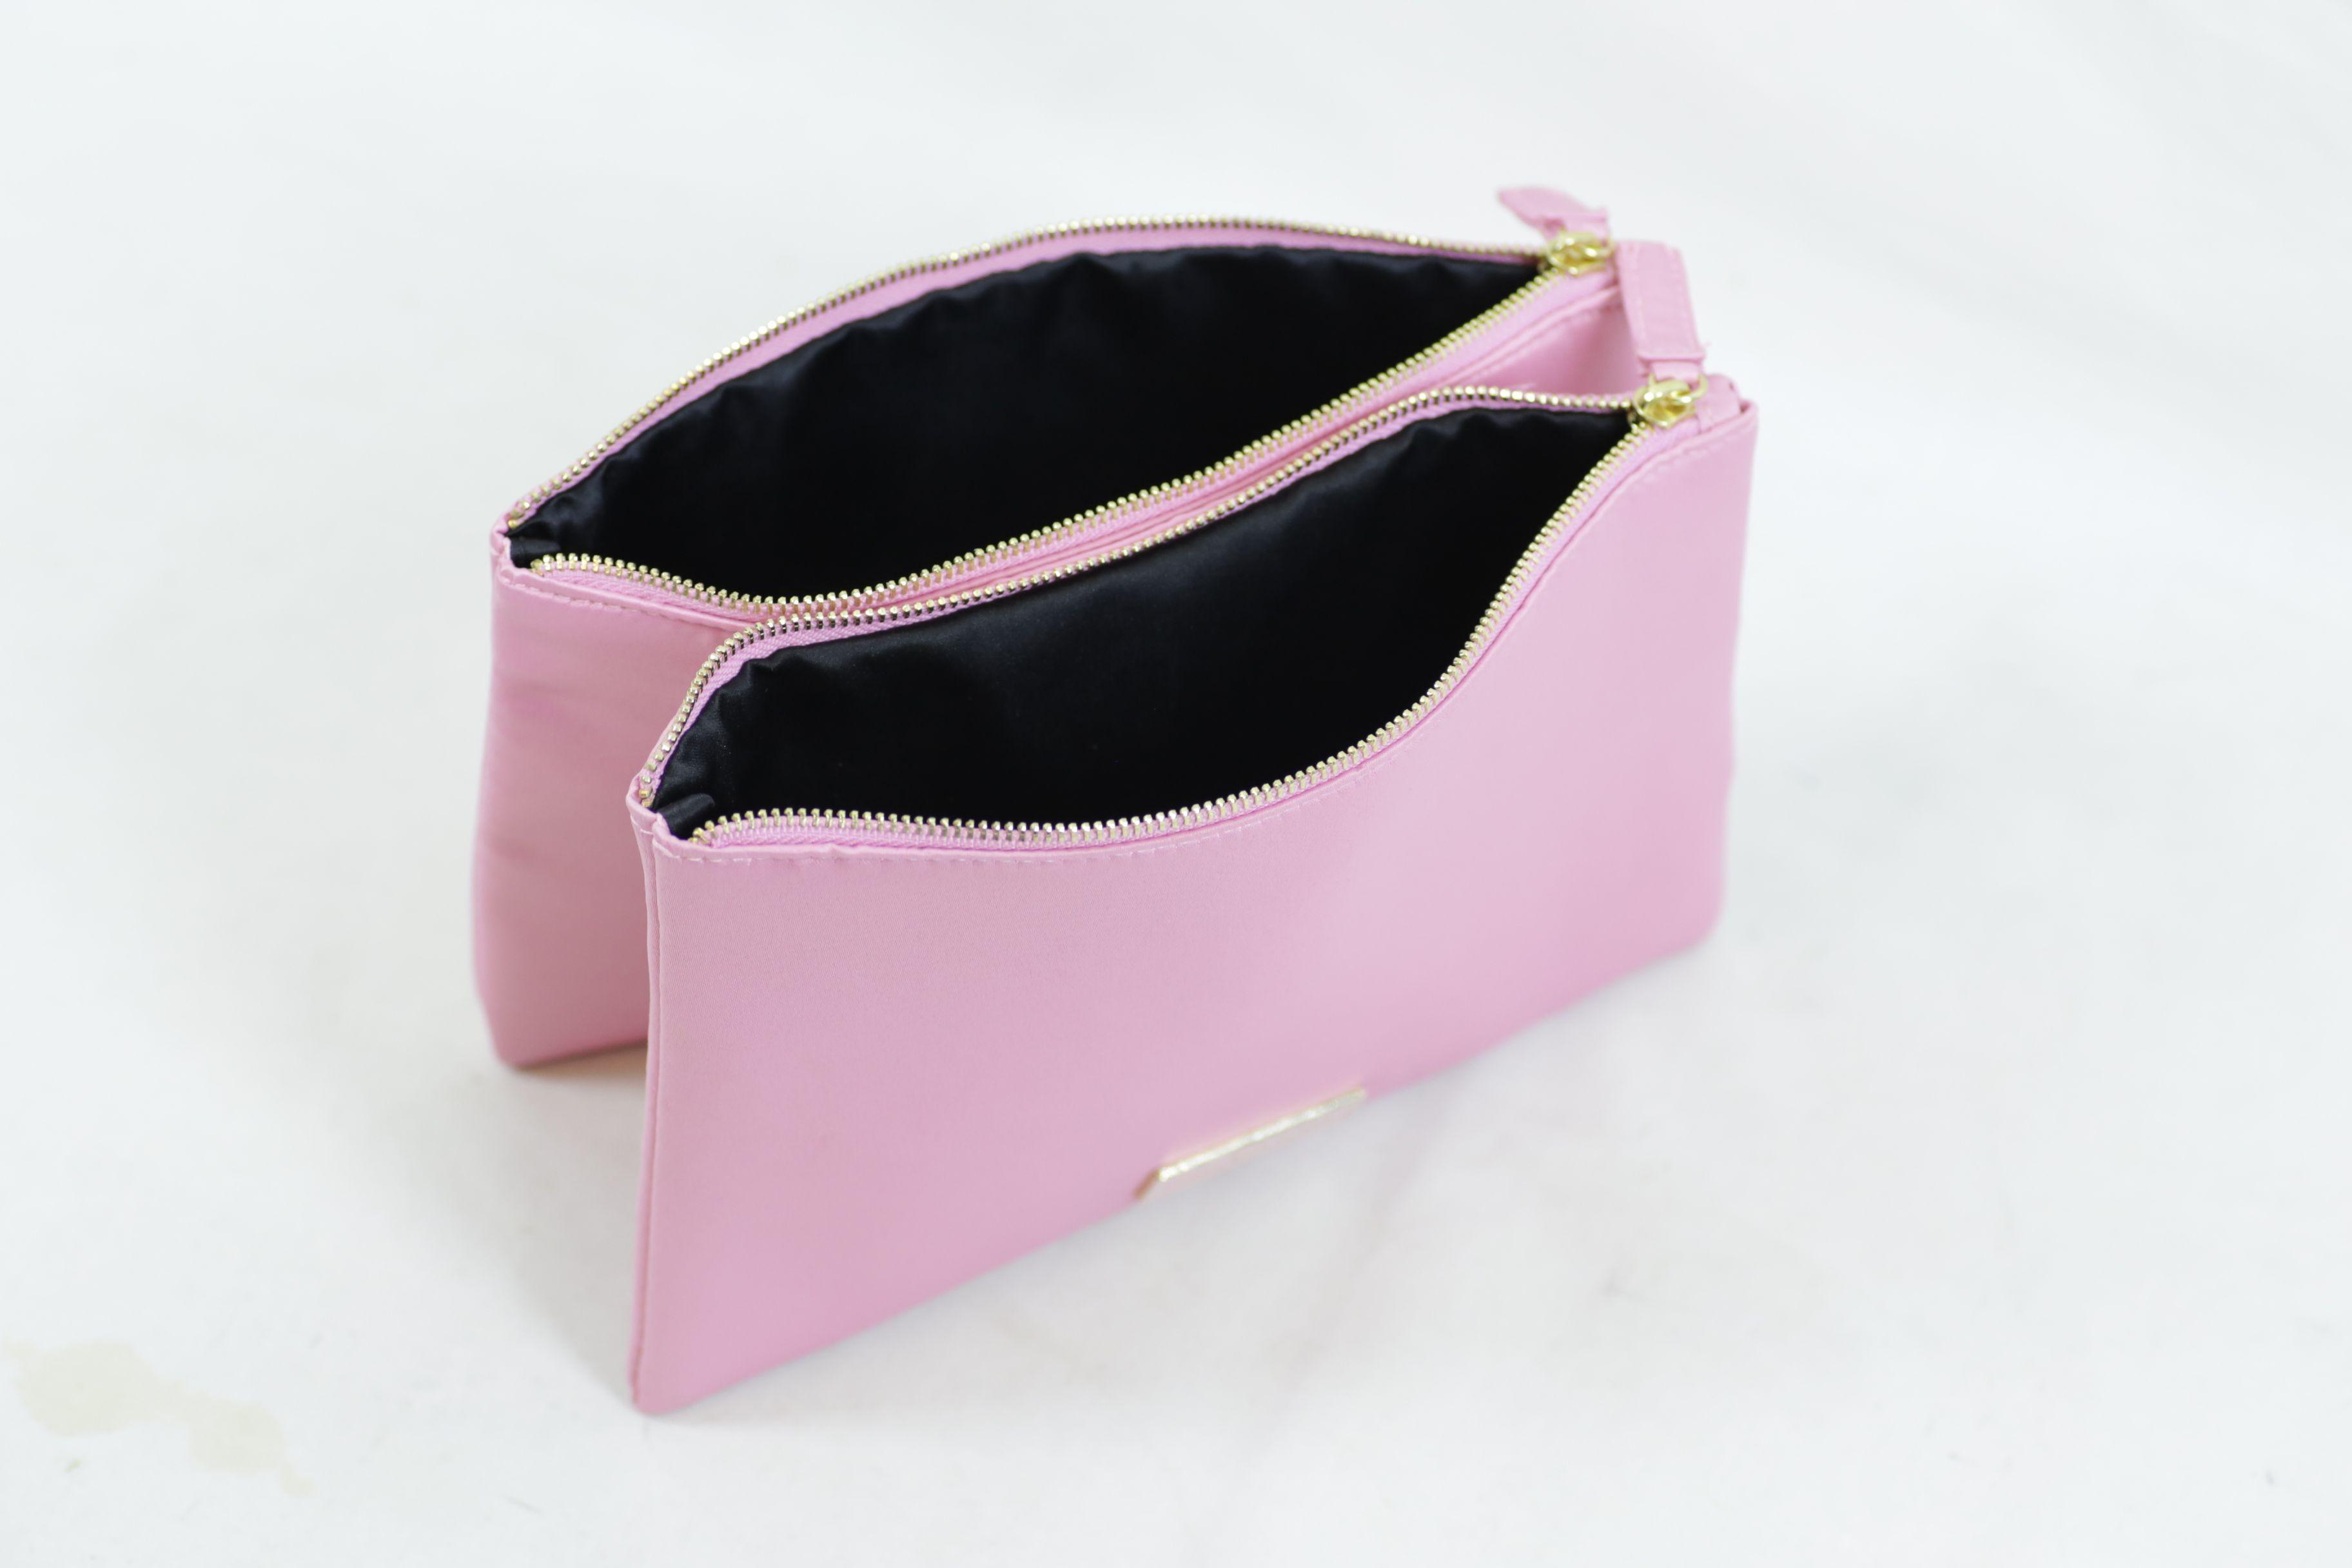 Prada Candy Pink Cosmetic Makeup Travel Case Bag